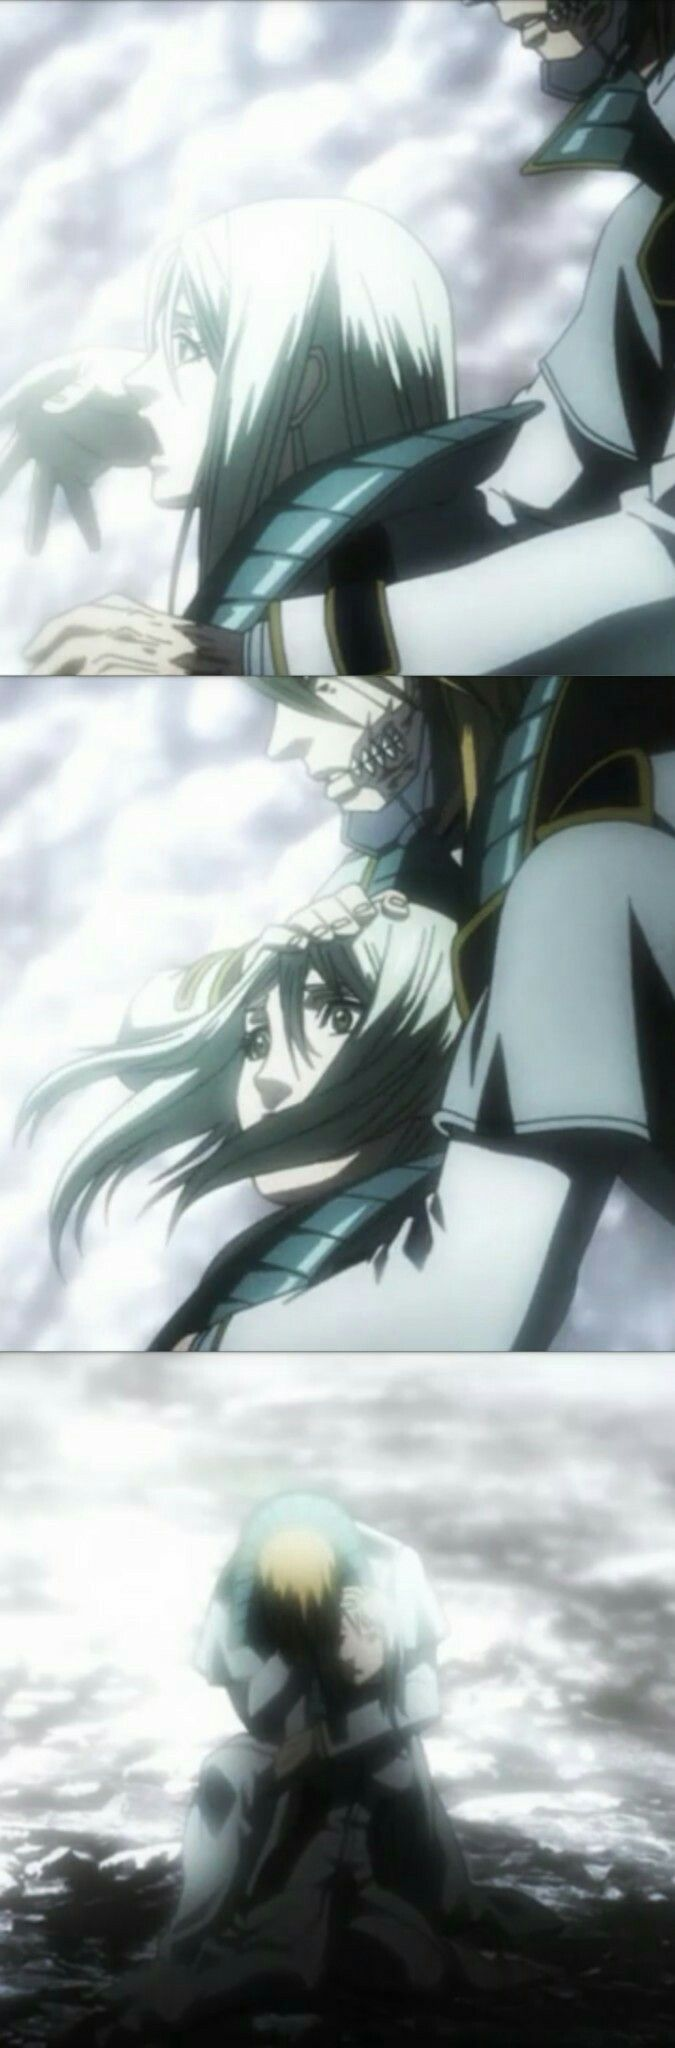 Adolf and Eva ❤  Terra formars #anime #coupleanime